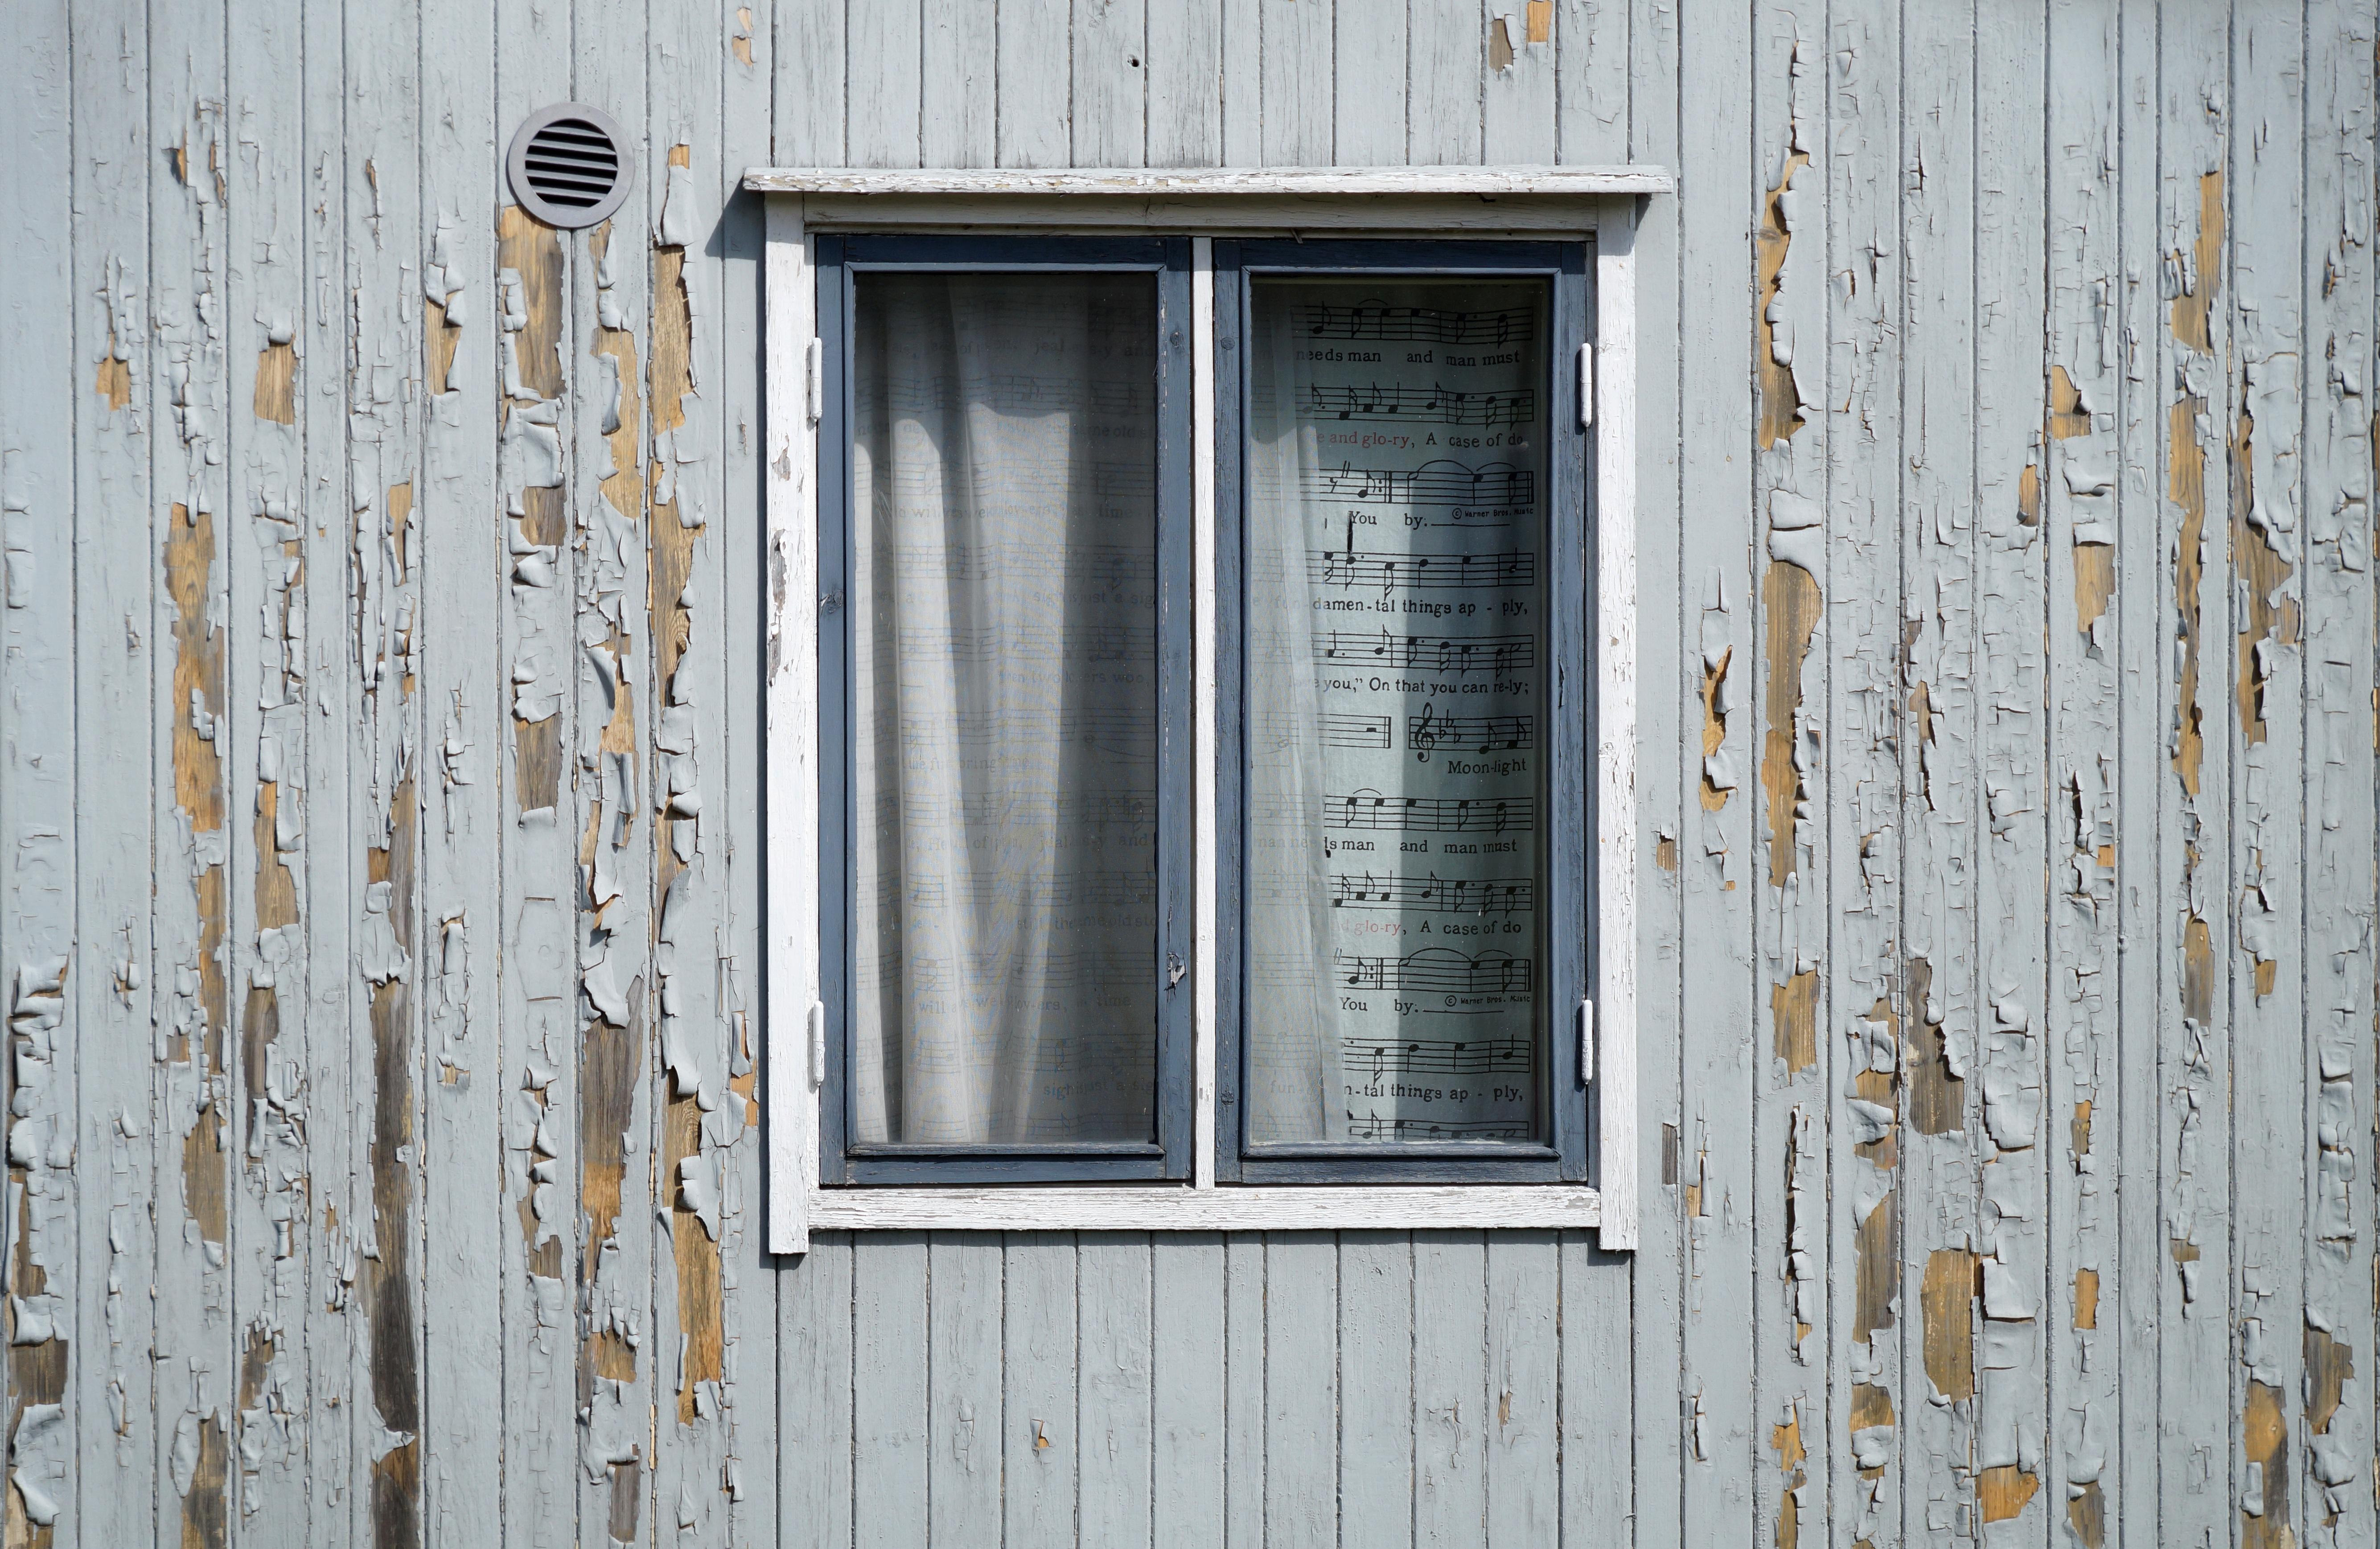 Fotos gratis : madera, blanco, pared, reparar, marco, pintar ...